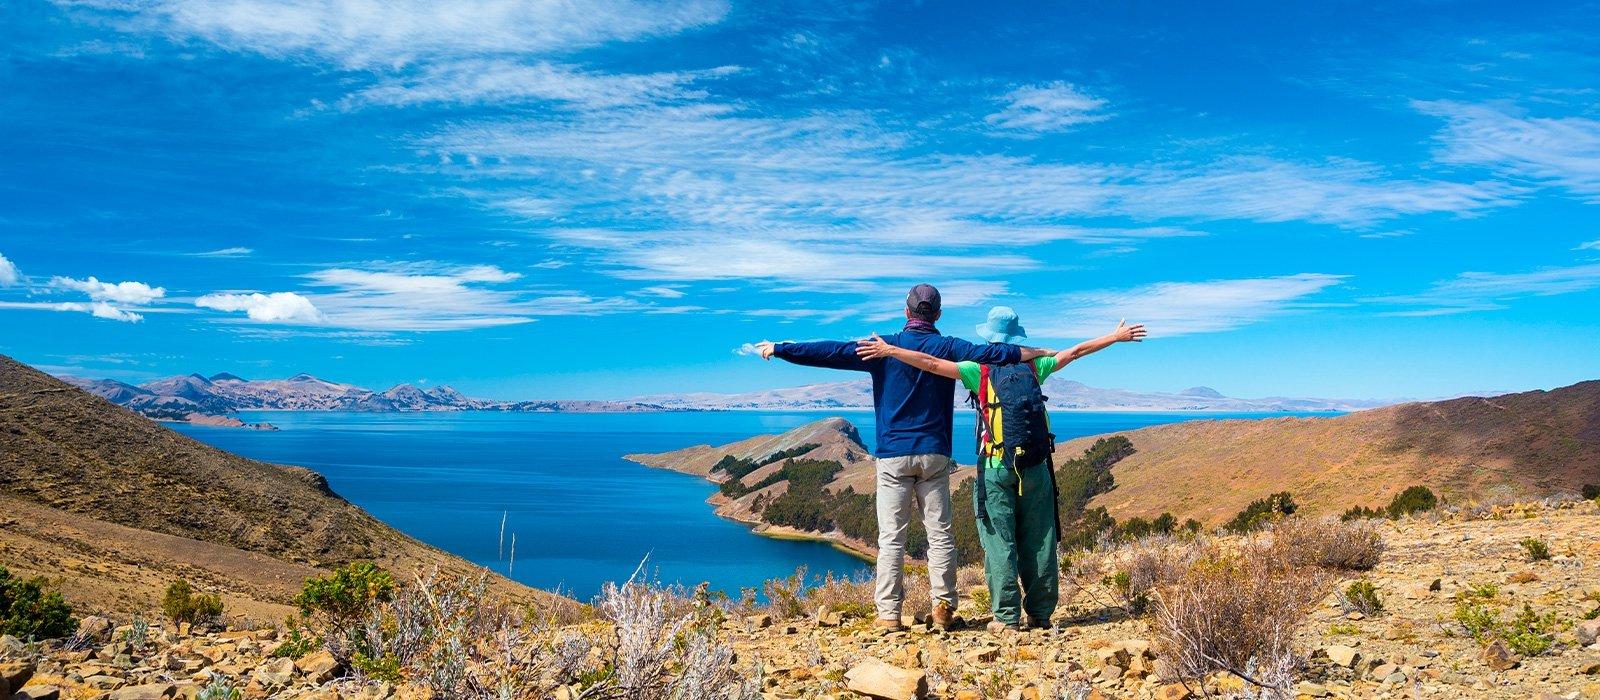 Catamaran Cruiser (Sun Island, Inti Wata, Titicaca Lake) to La Paz